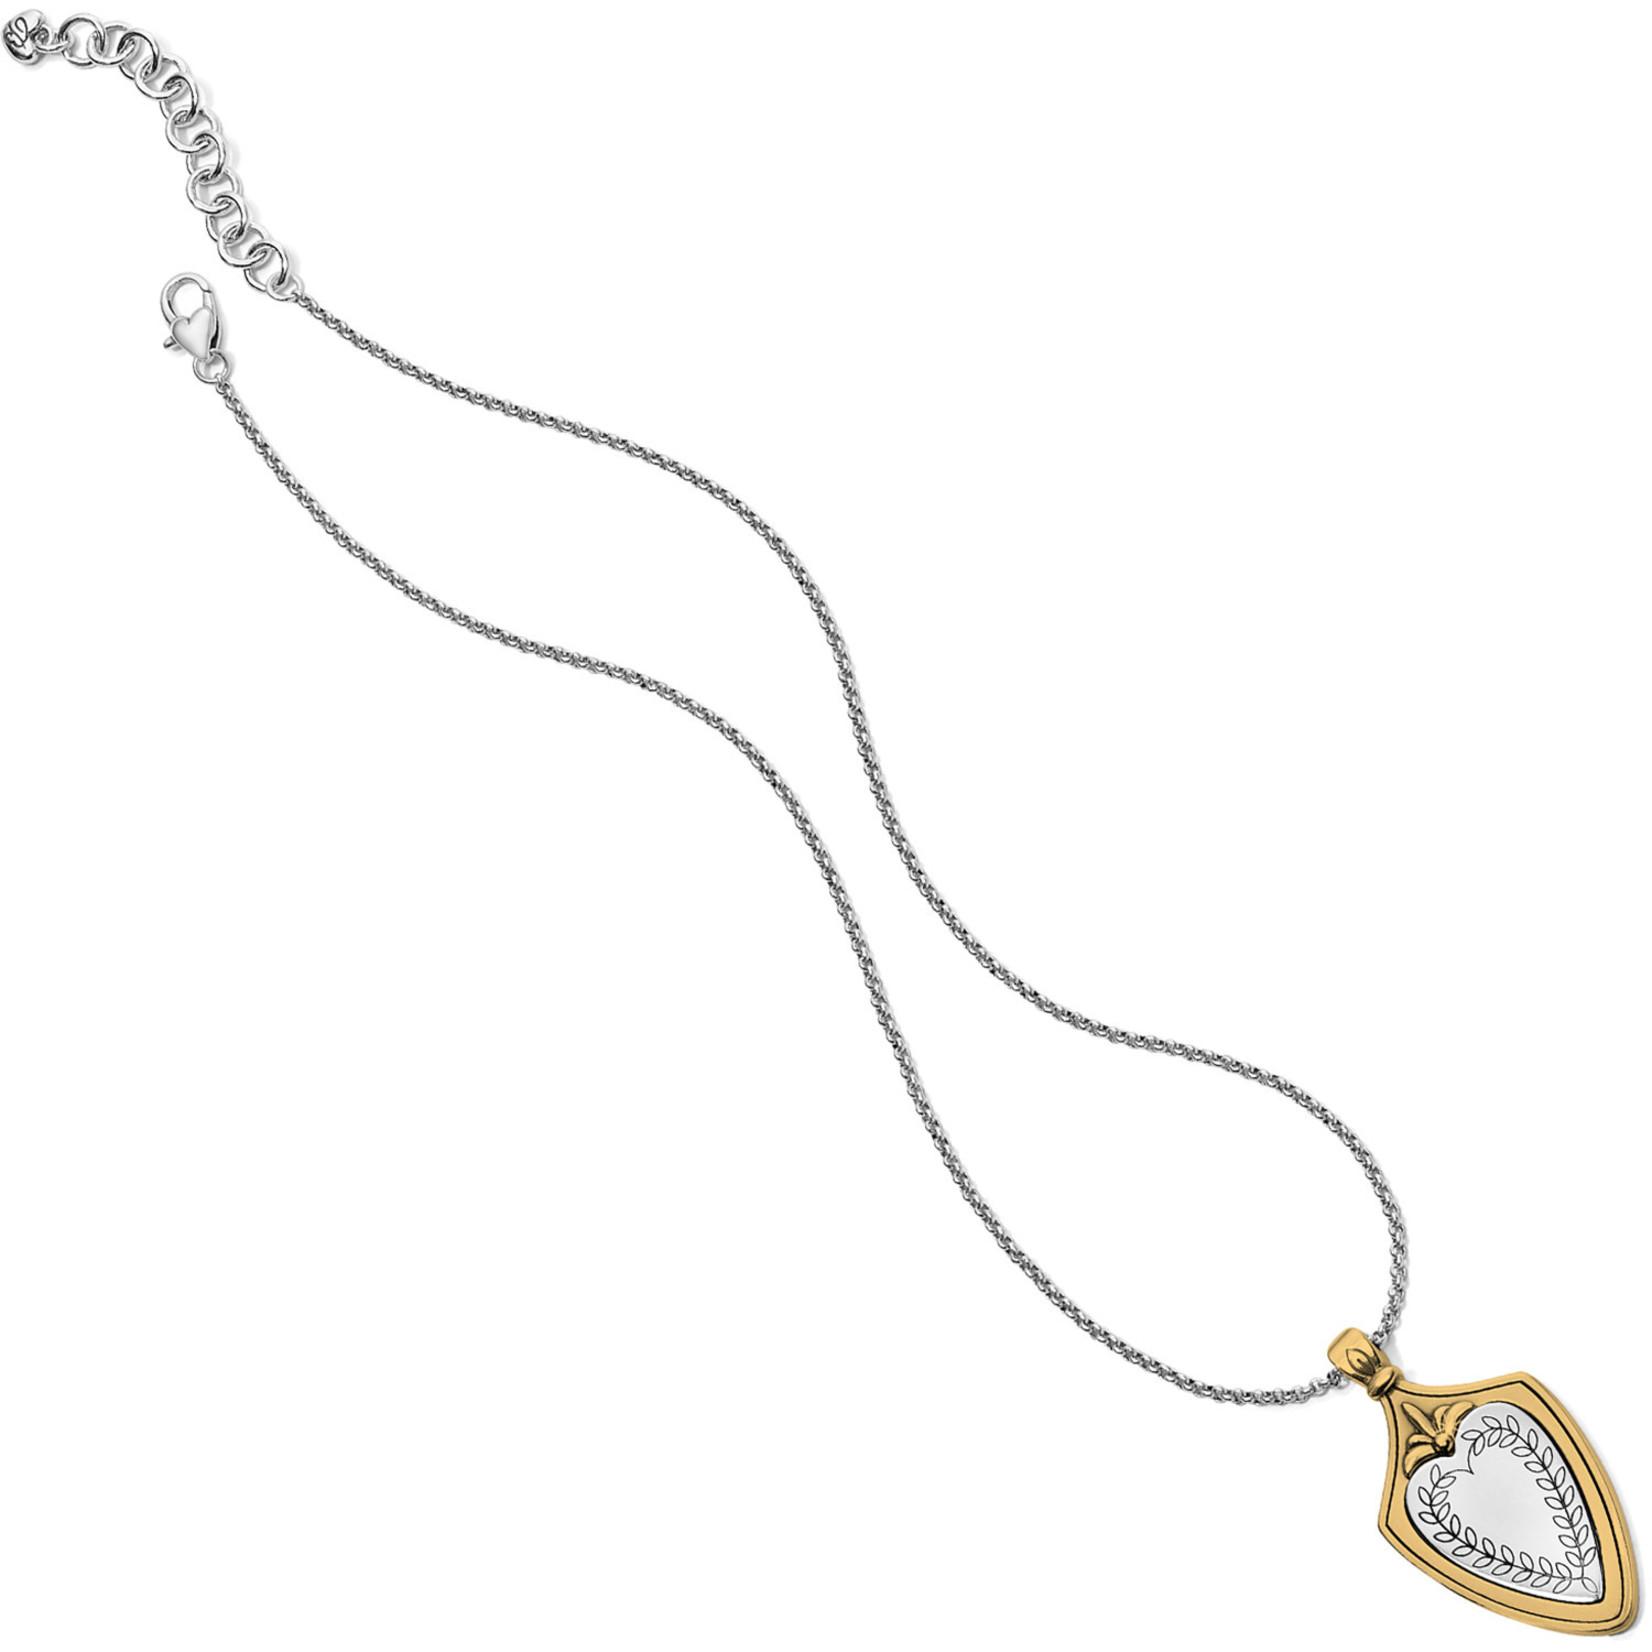 Brighton Medaille Crest Necklace